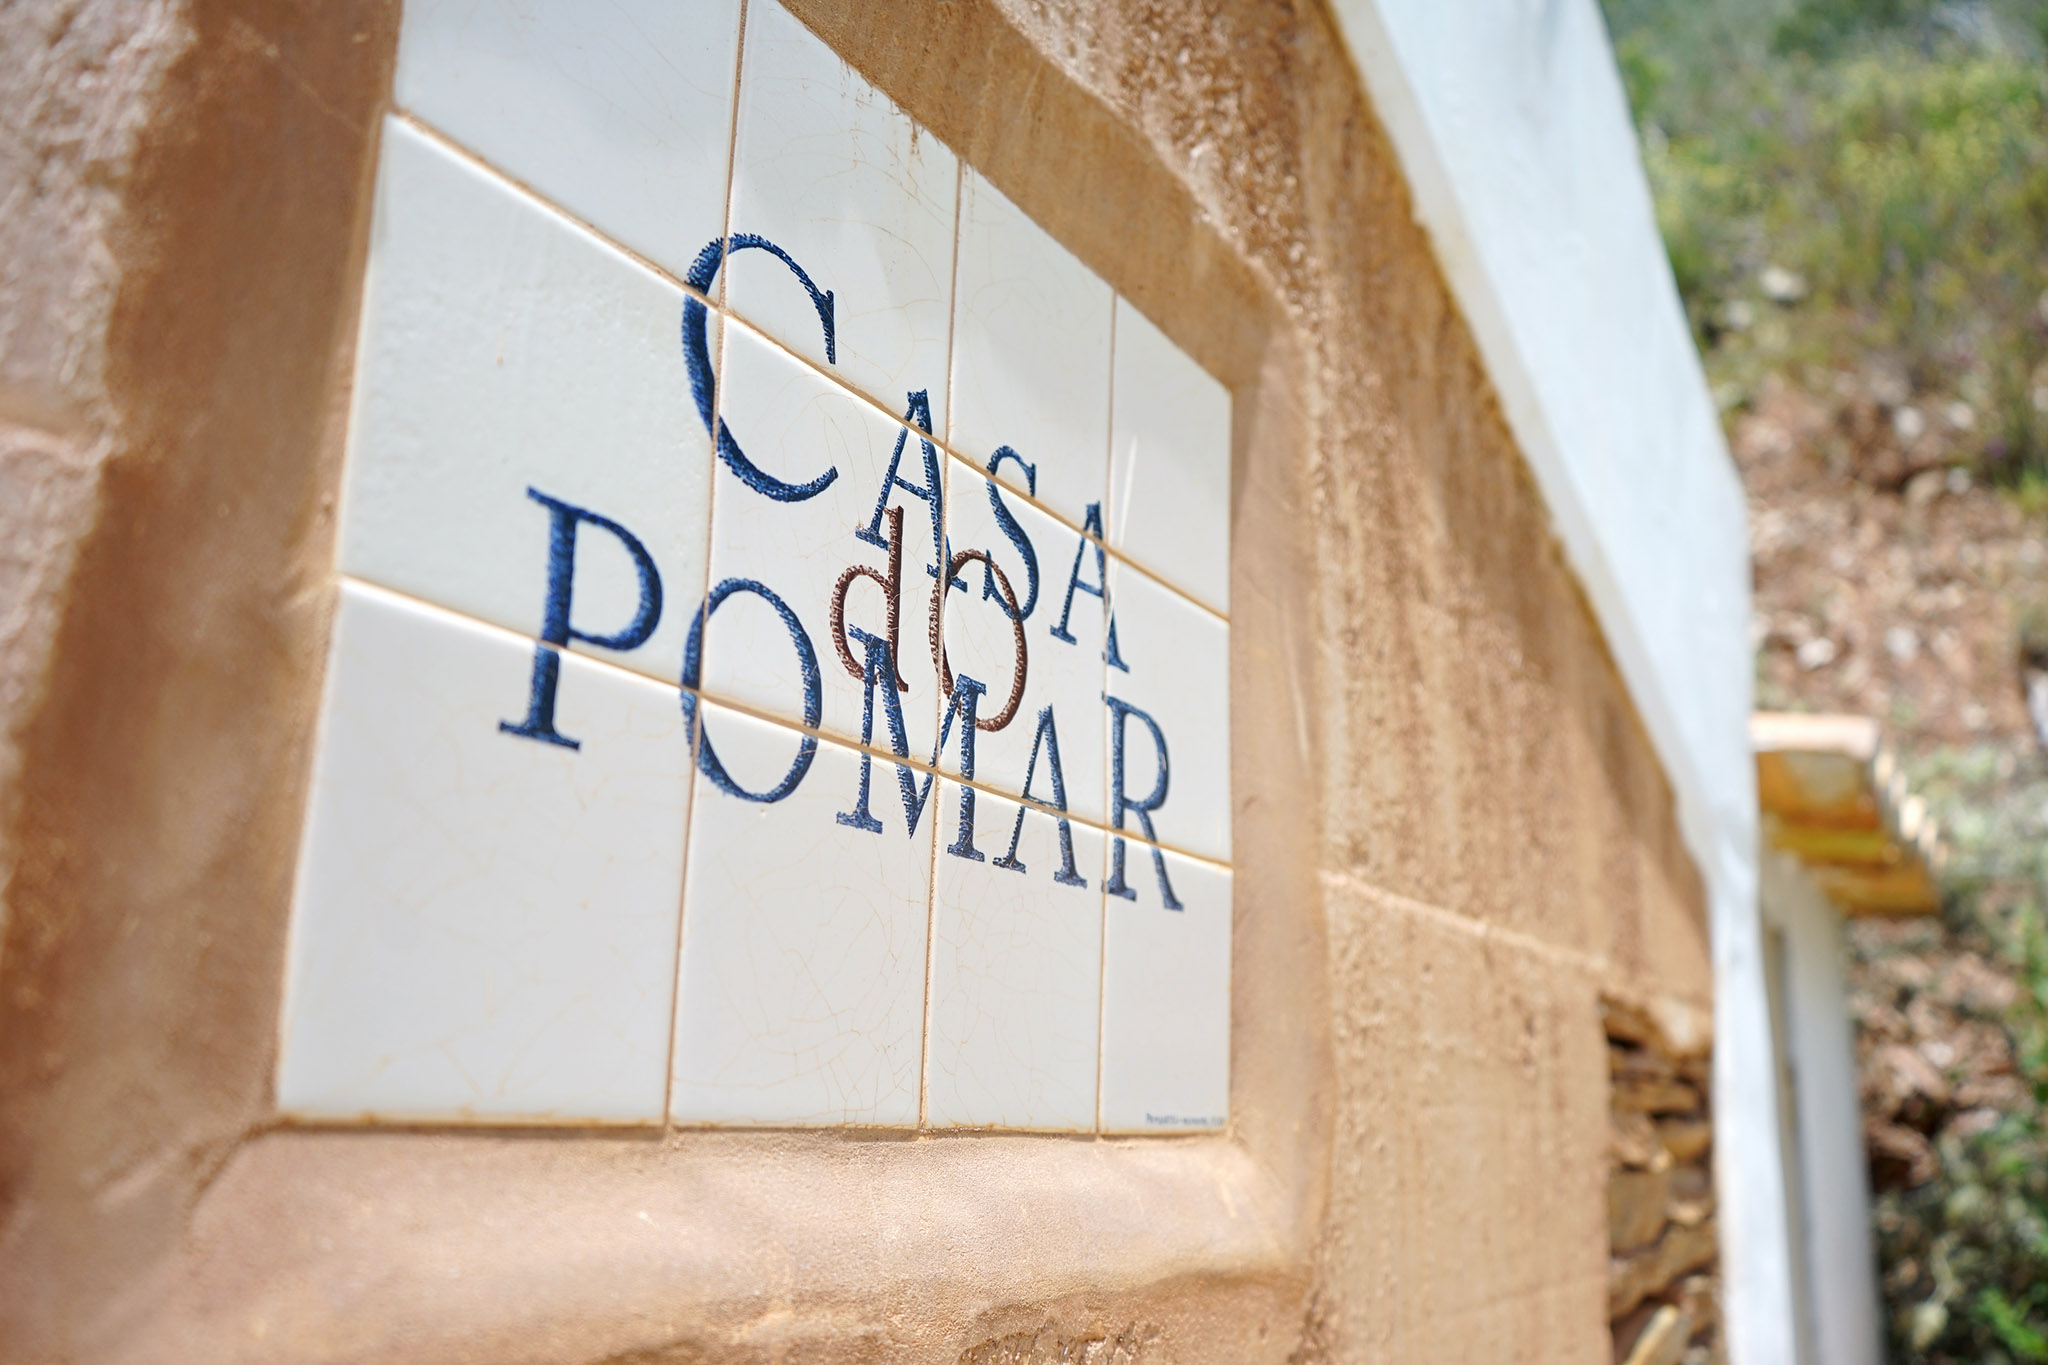 2017-04-Casas-da-Cerca-Portugal - casas-da-cerca-portugal-nectarandpulse-architecture-architecture-7.jpg